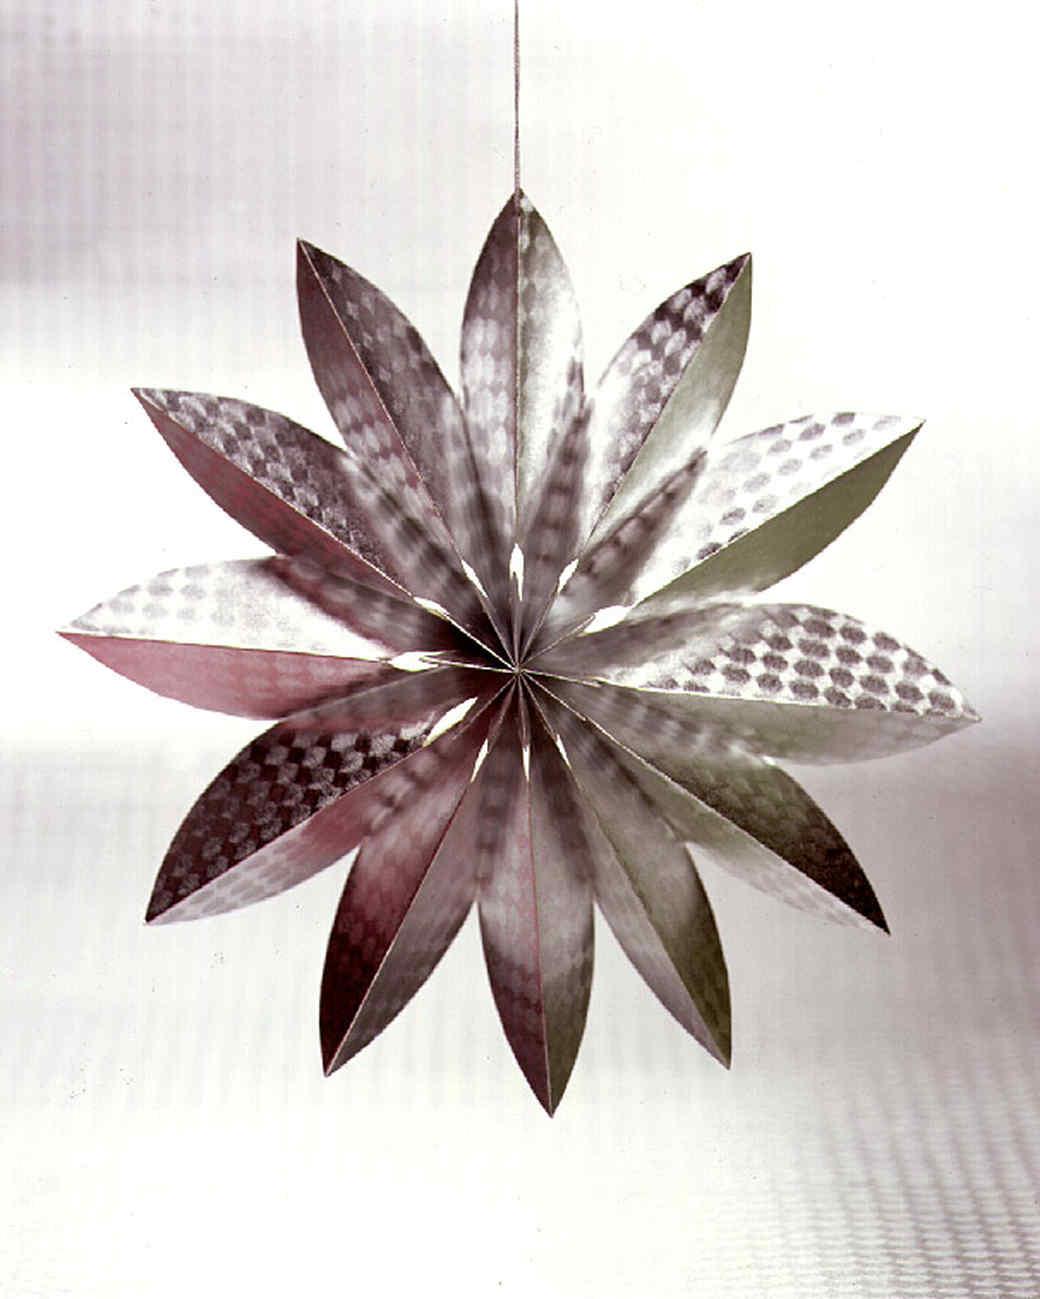 Homemade Christmas Star Ornament: Silver Star Ornaments & Video